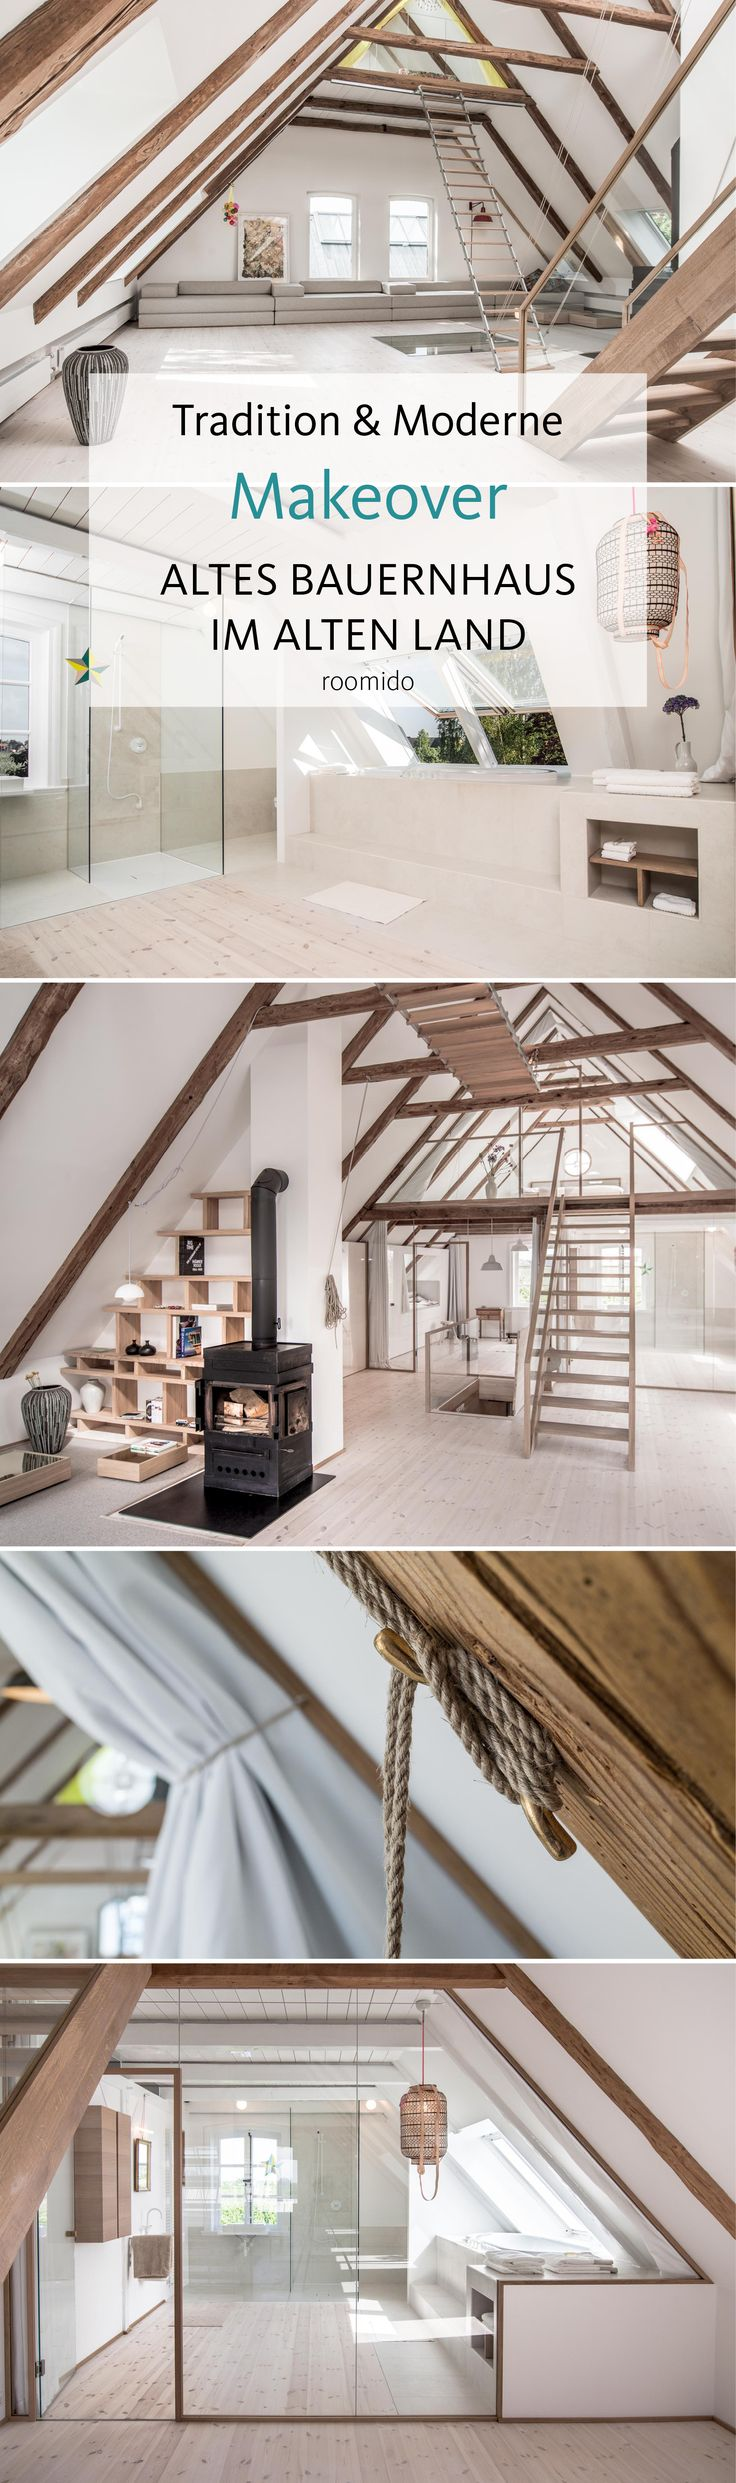 Home design bilder interieur  best living images on pinterest